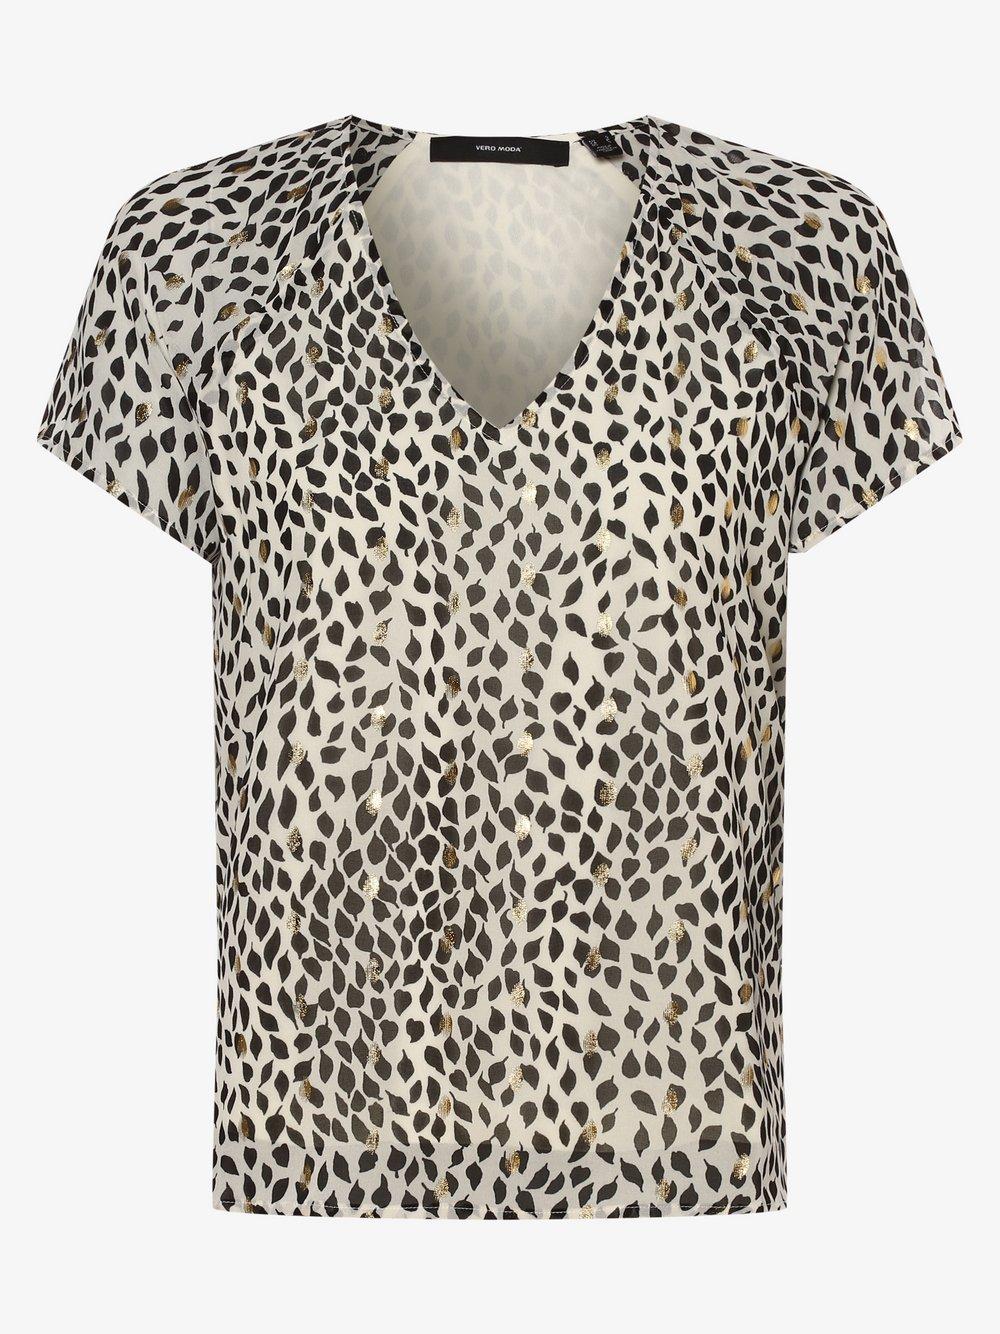 Vero Moda – Bluzka damska – VMPenny, beżowy Van Graaf 473380-0001-09920